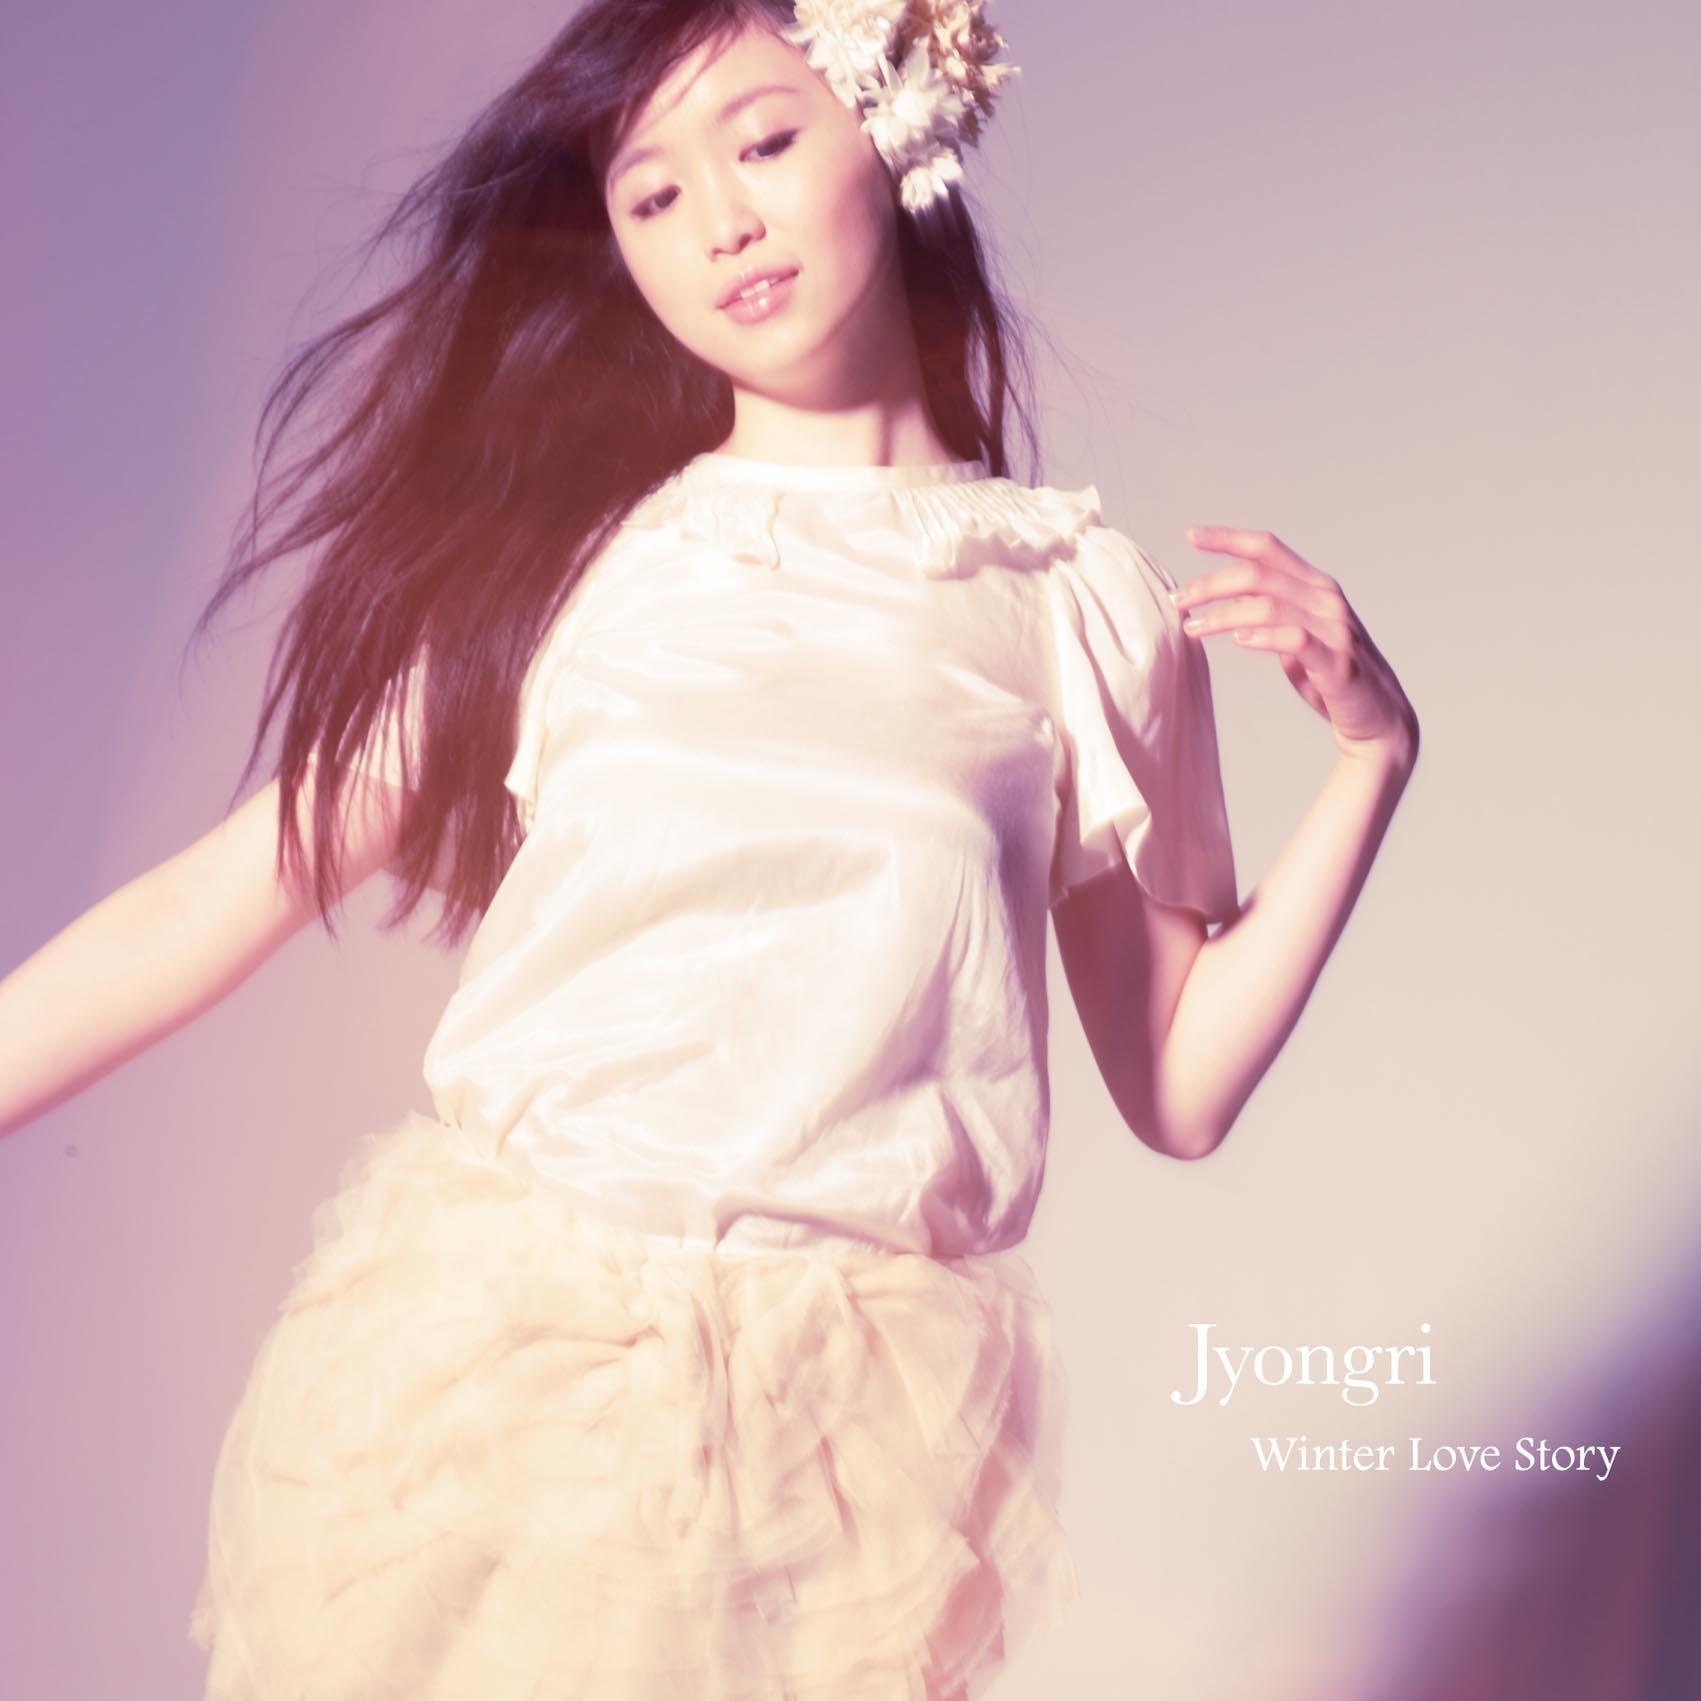 20170203.21.39 Jyongri - Winter Love Story cover.jpg